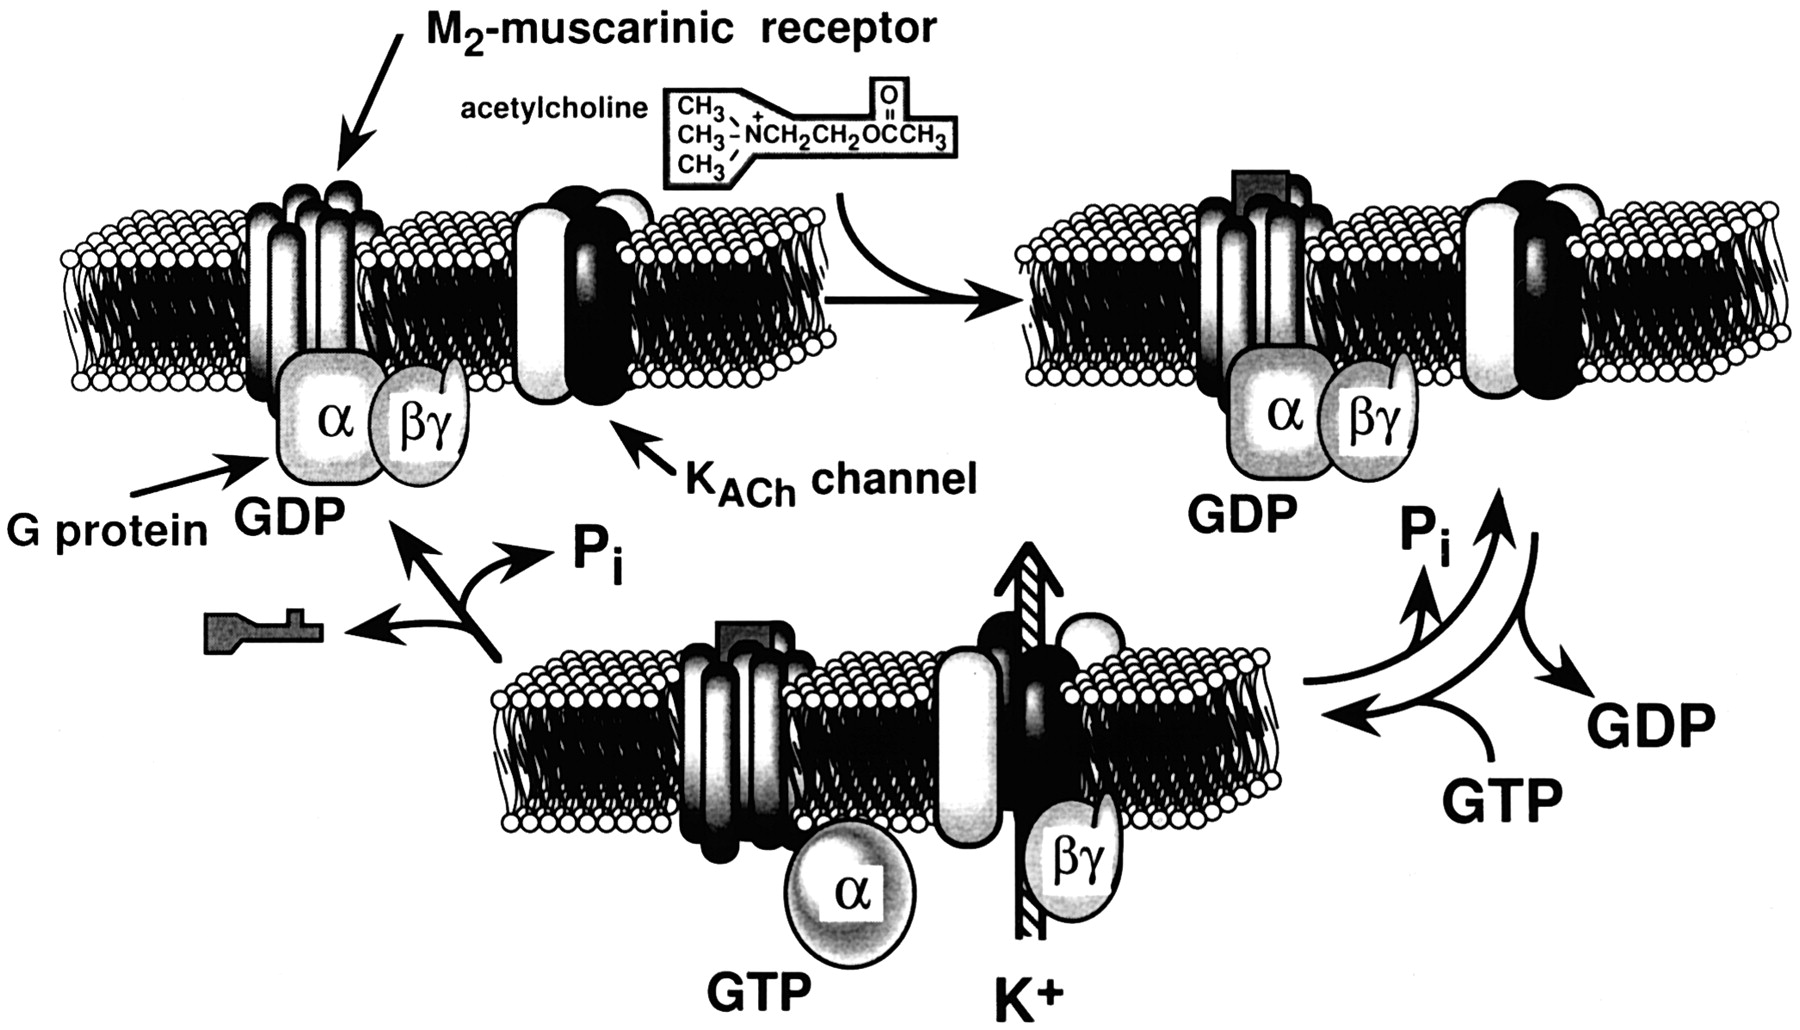 g protein regulation of potassium ion channels